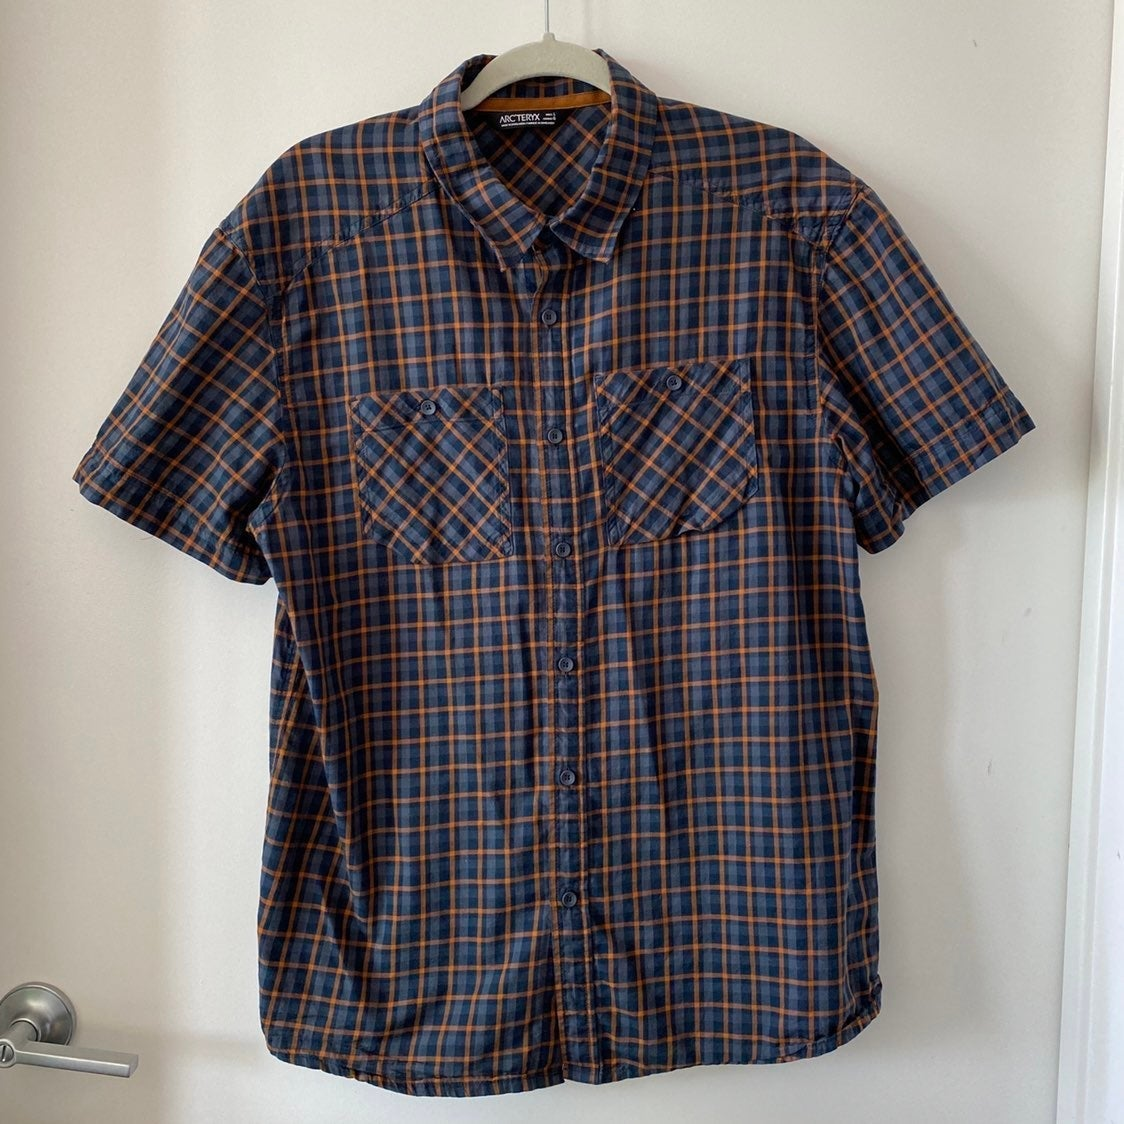 Arx'teryx Gryson plaid shirt